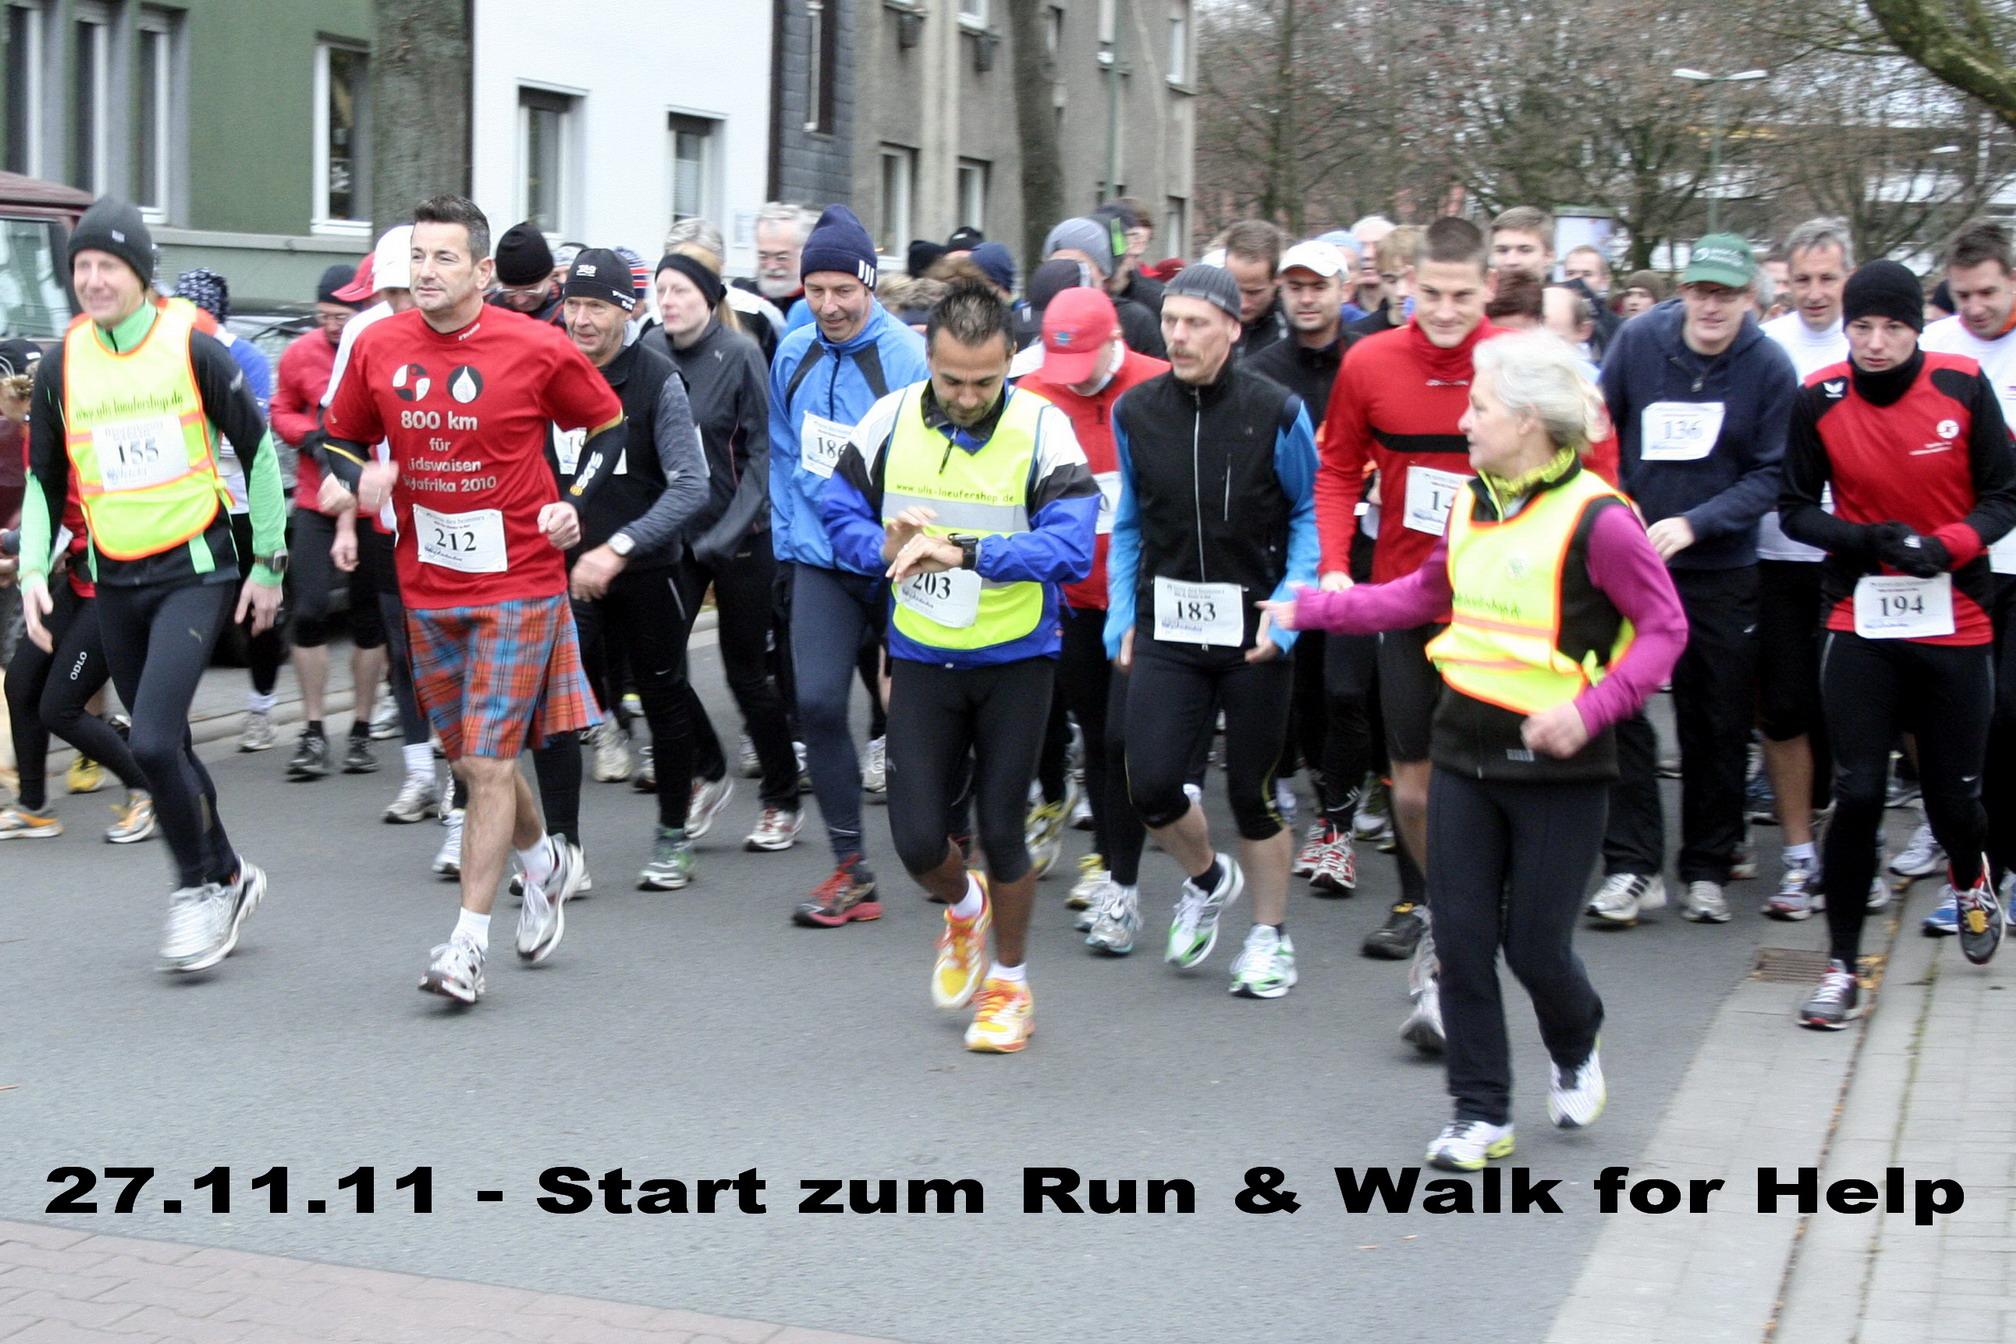 2011-11-27-r_w-start_mg_5018_bildgroesse_aendern